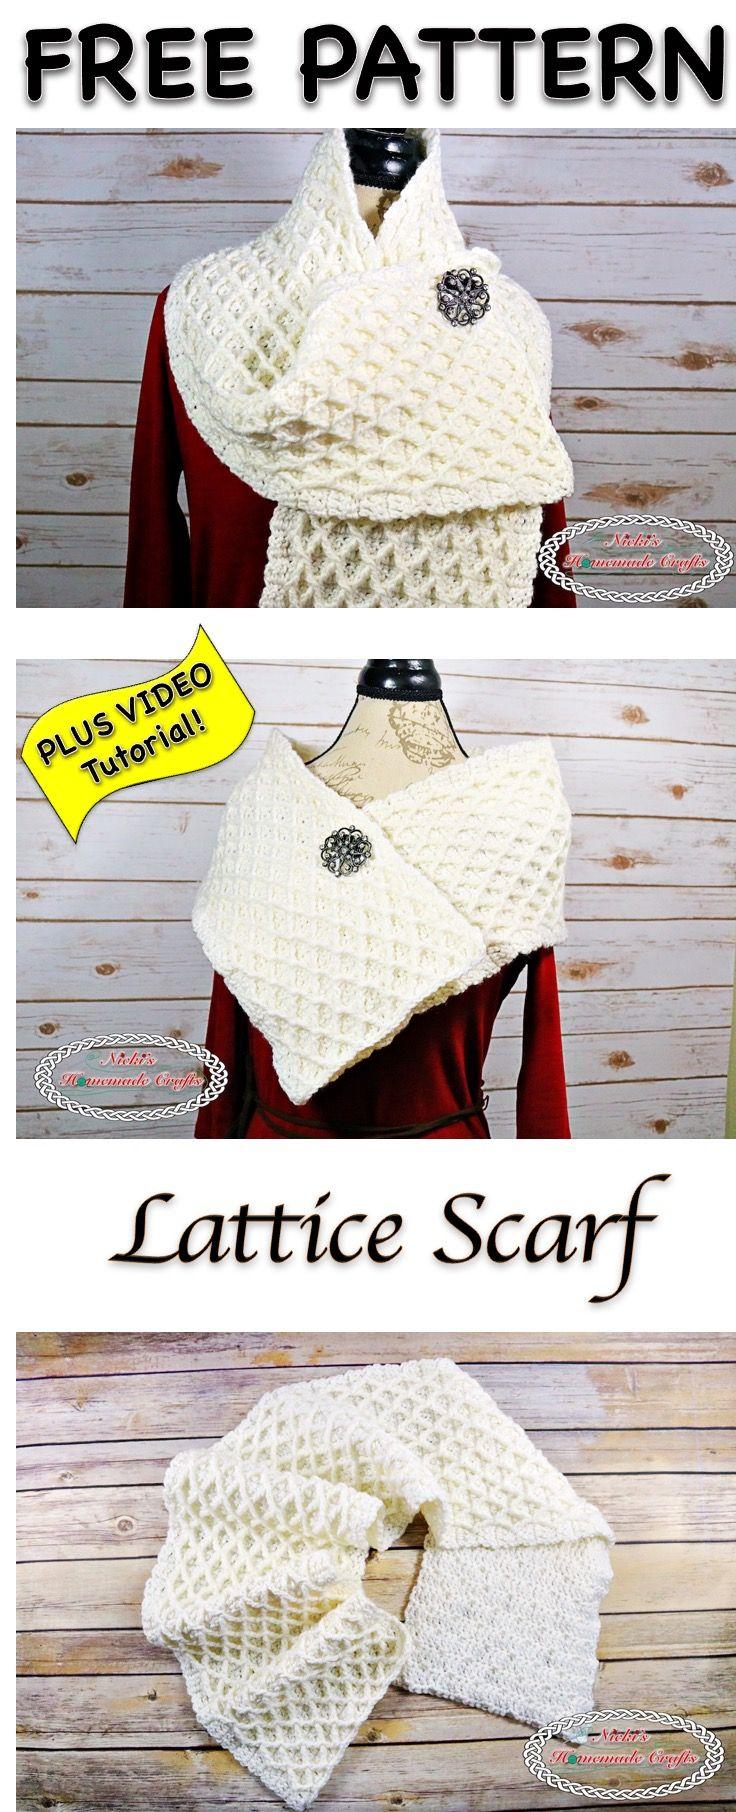 Lattice scarf free crochet pattern nickis homemade crafts lattice scarf free crochet pattern bankloansurffo Images